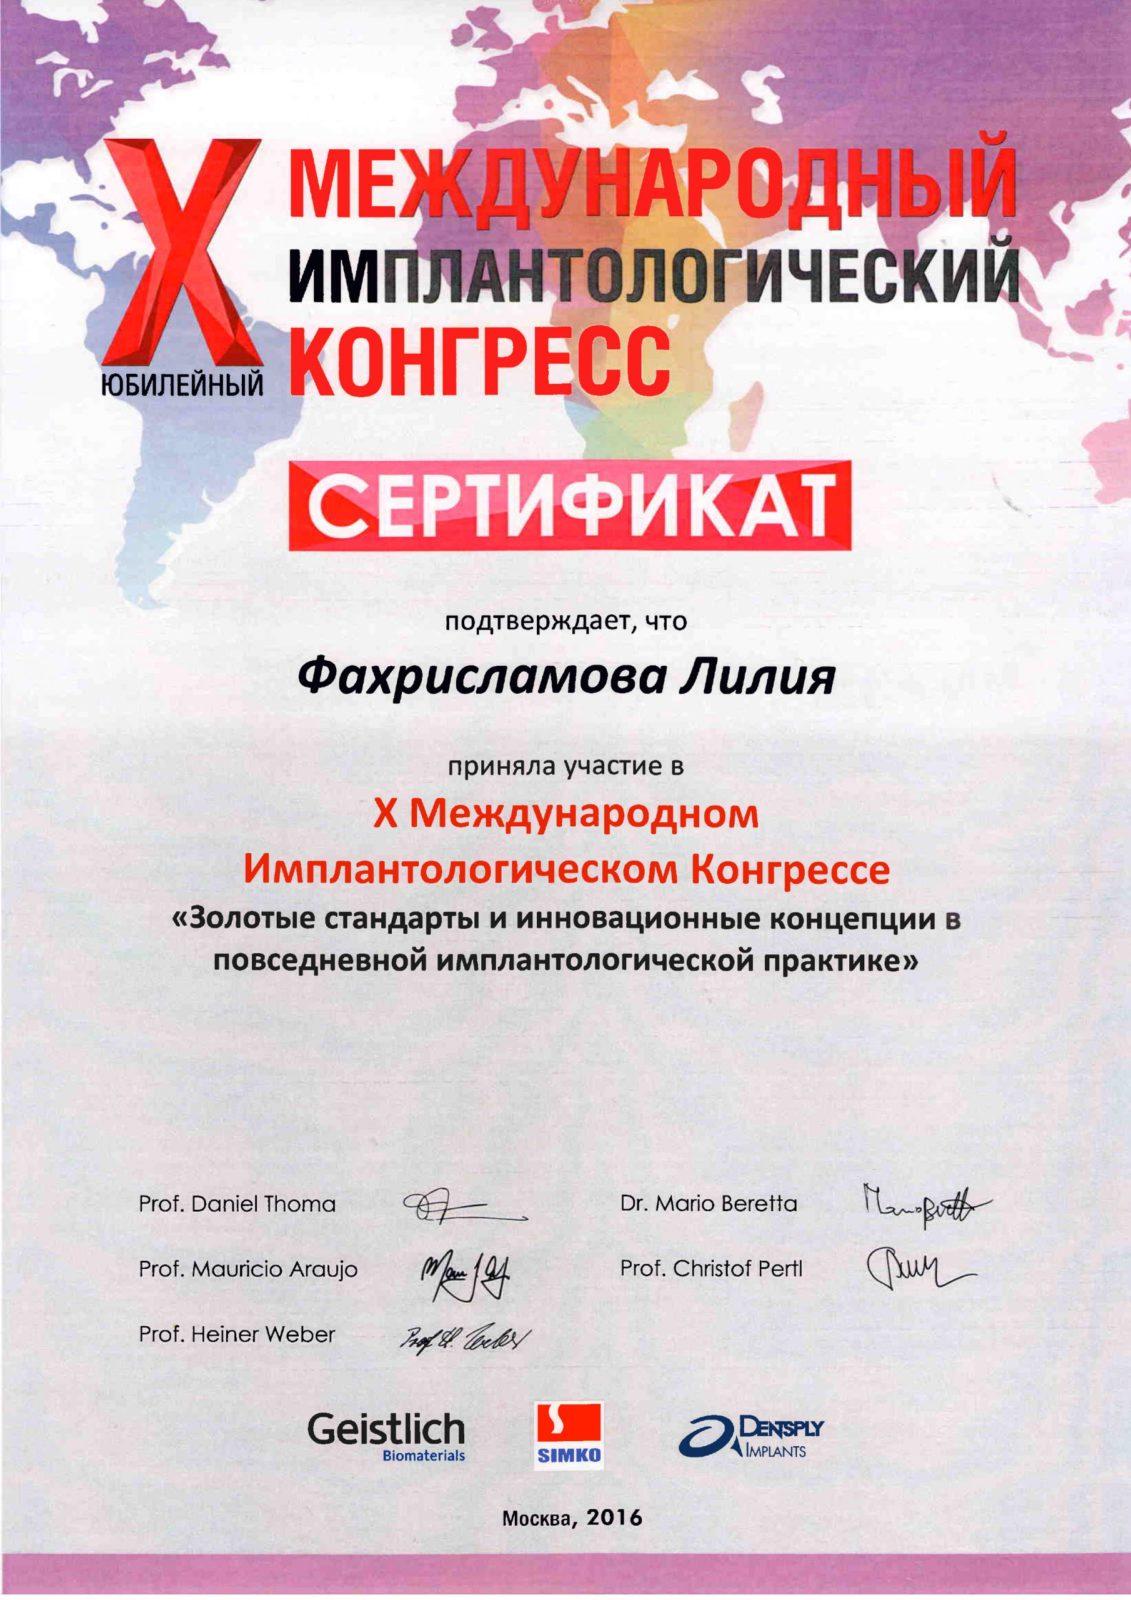 http://oris-vidnoe.ru/wp-content/uploads/2021/05/7-scaled.jpeg